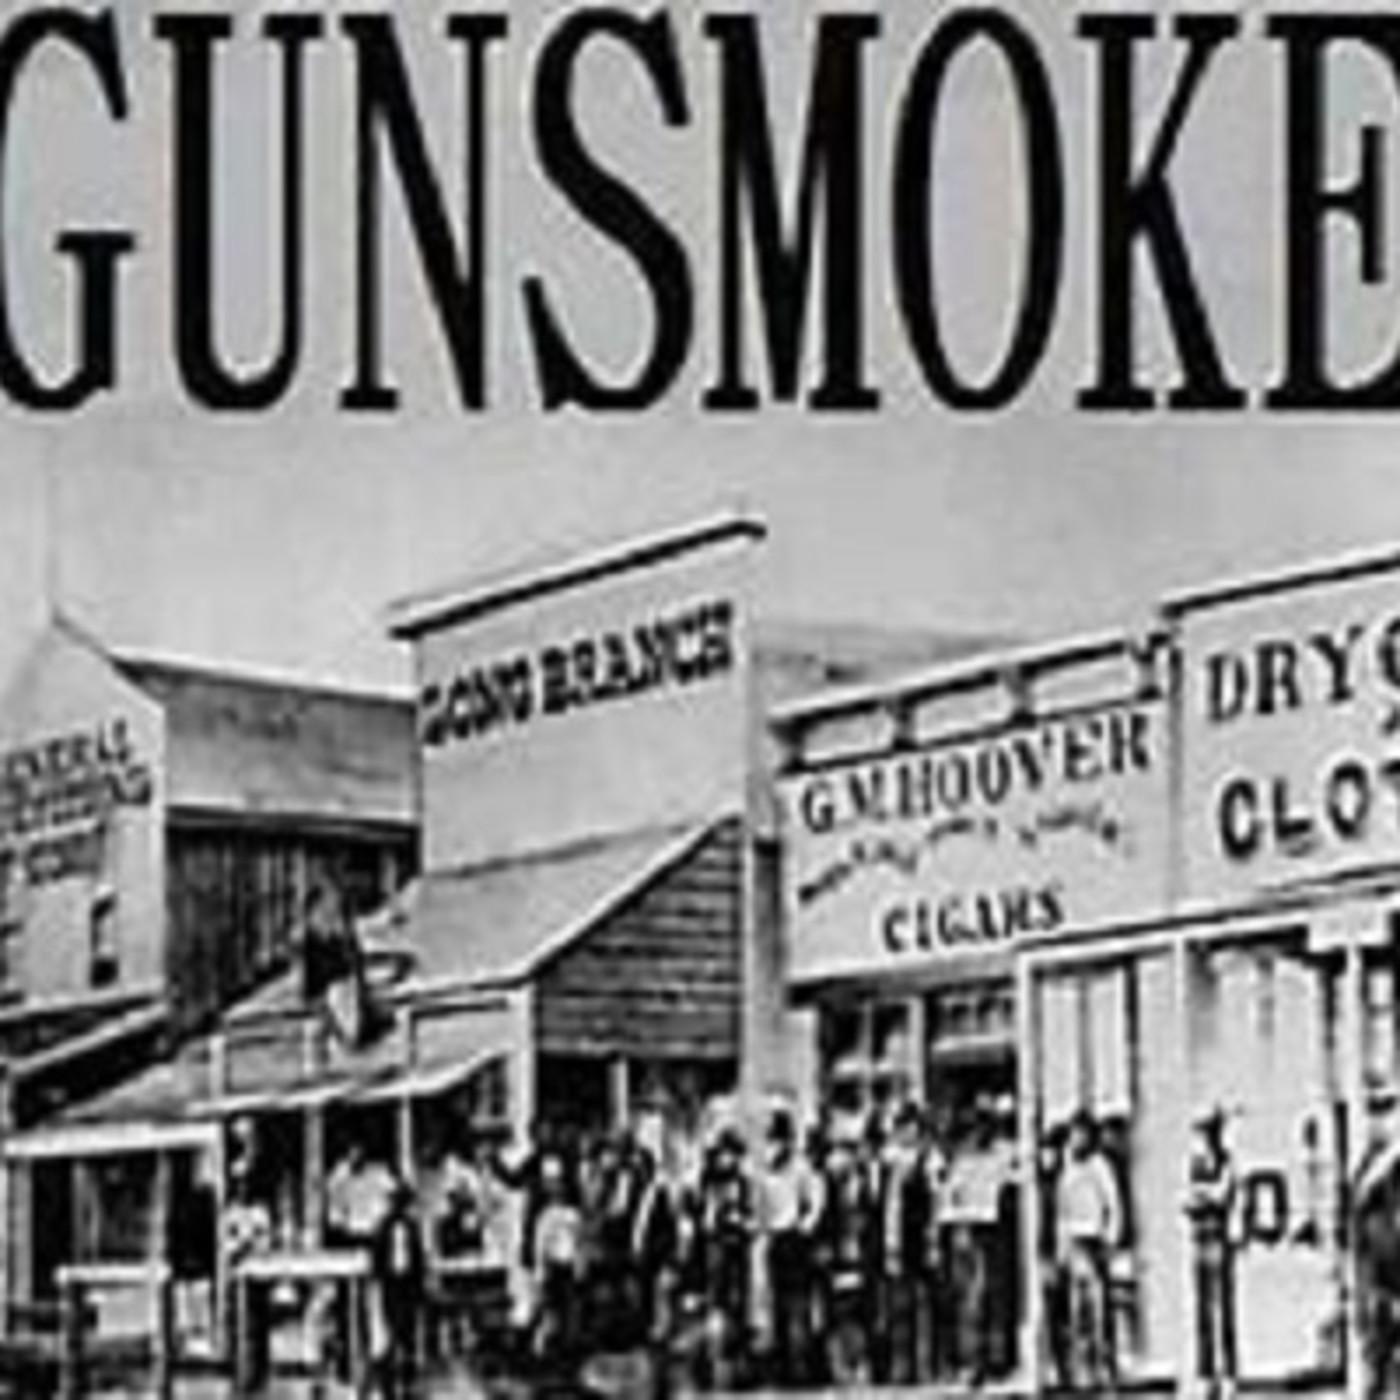 Gunsmoke 61-05-14 (475) The Lady Killer